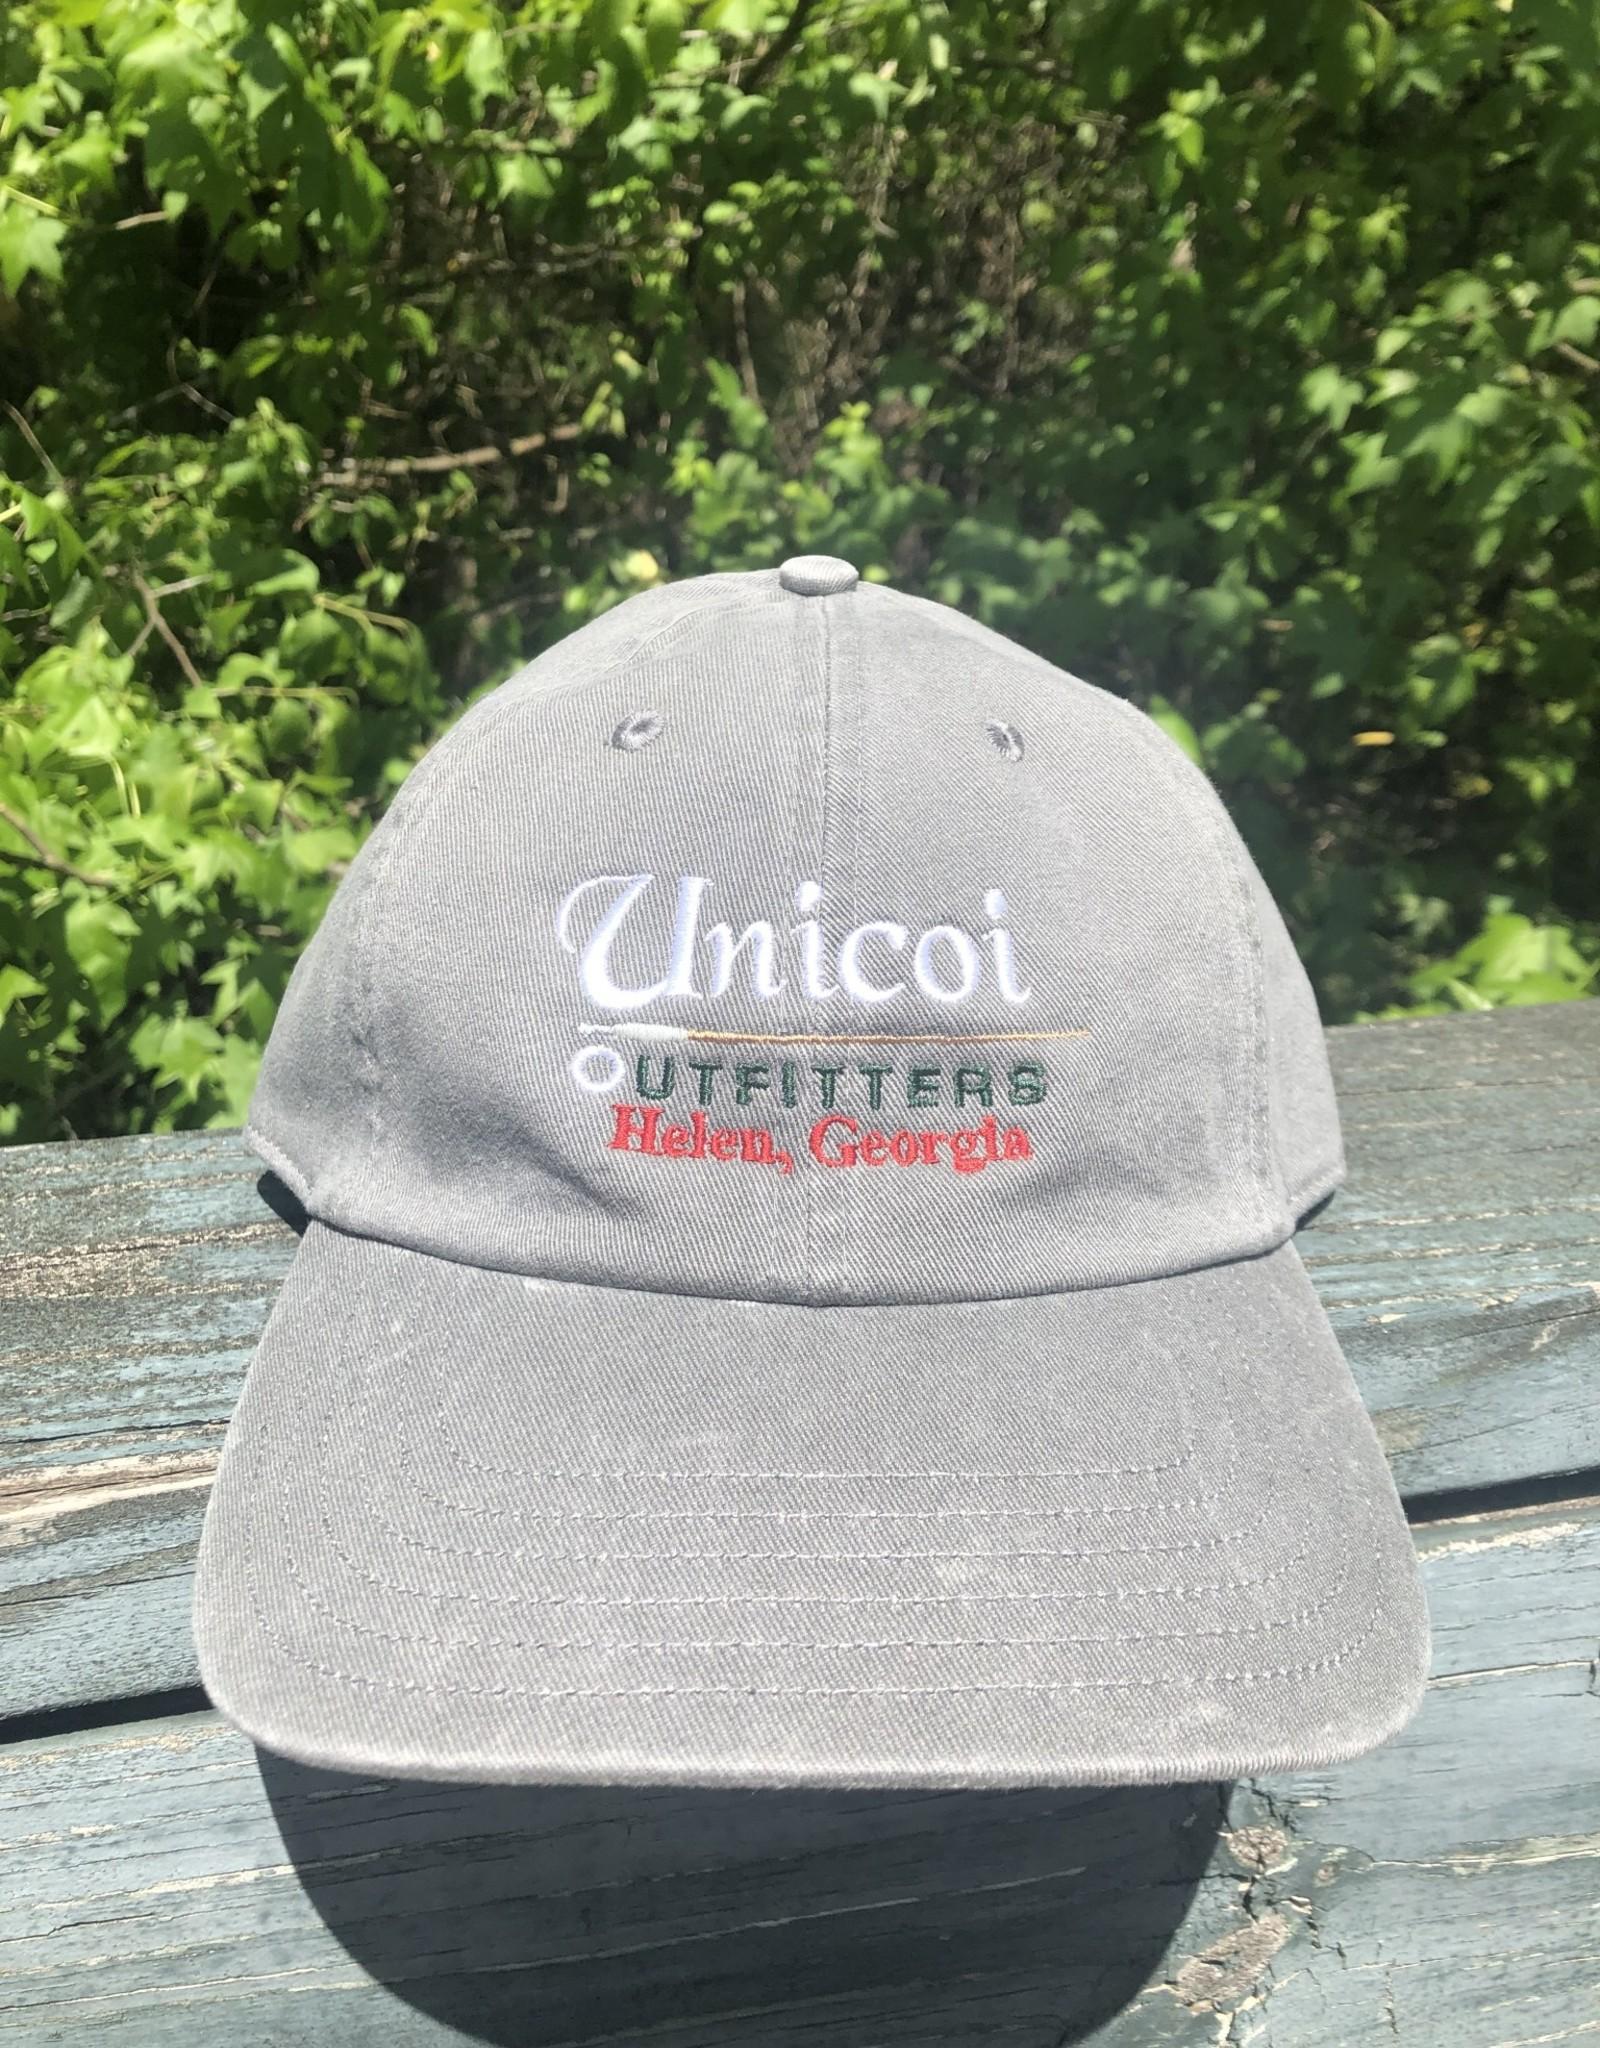 Unicoi Outfitters Simms Unicoi Outfitters Logo Single Haul Cap